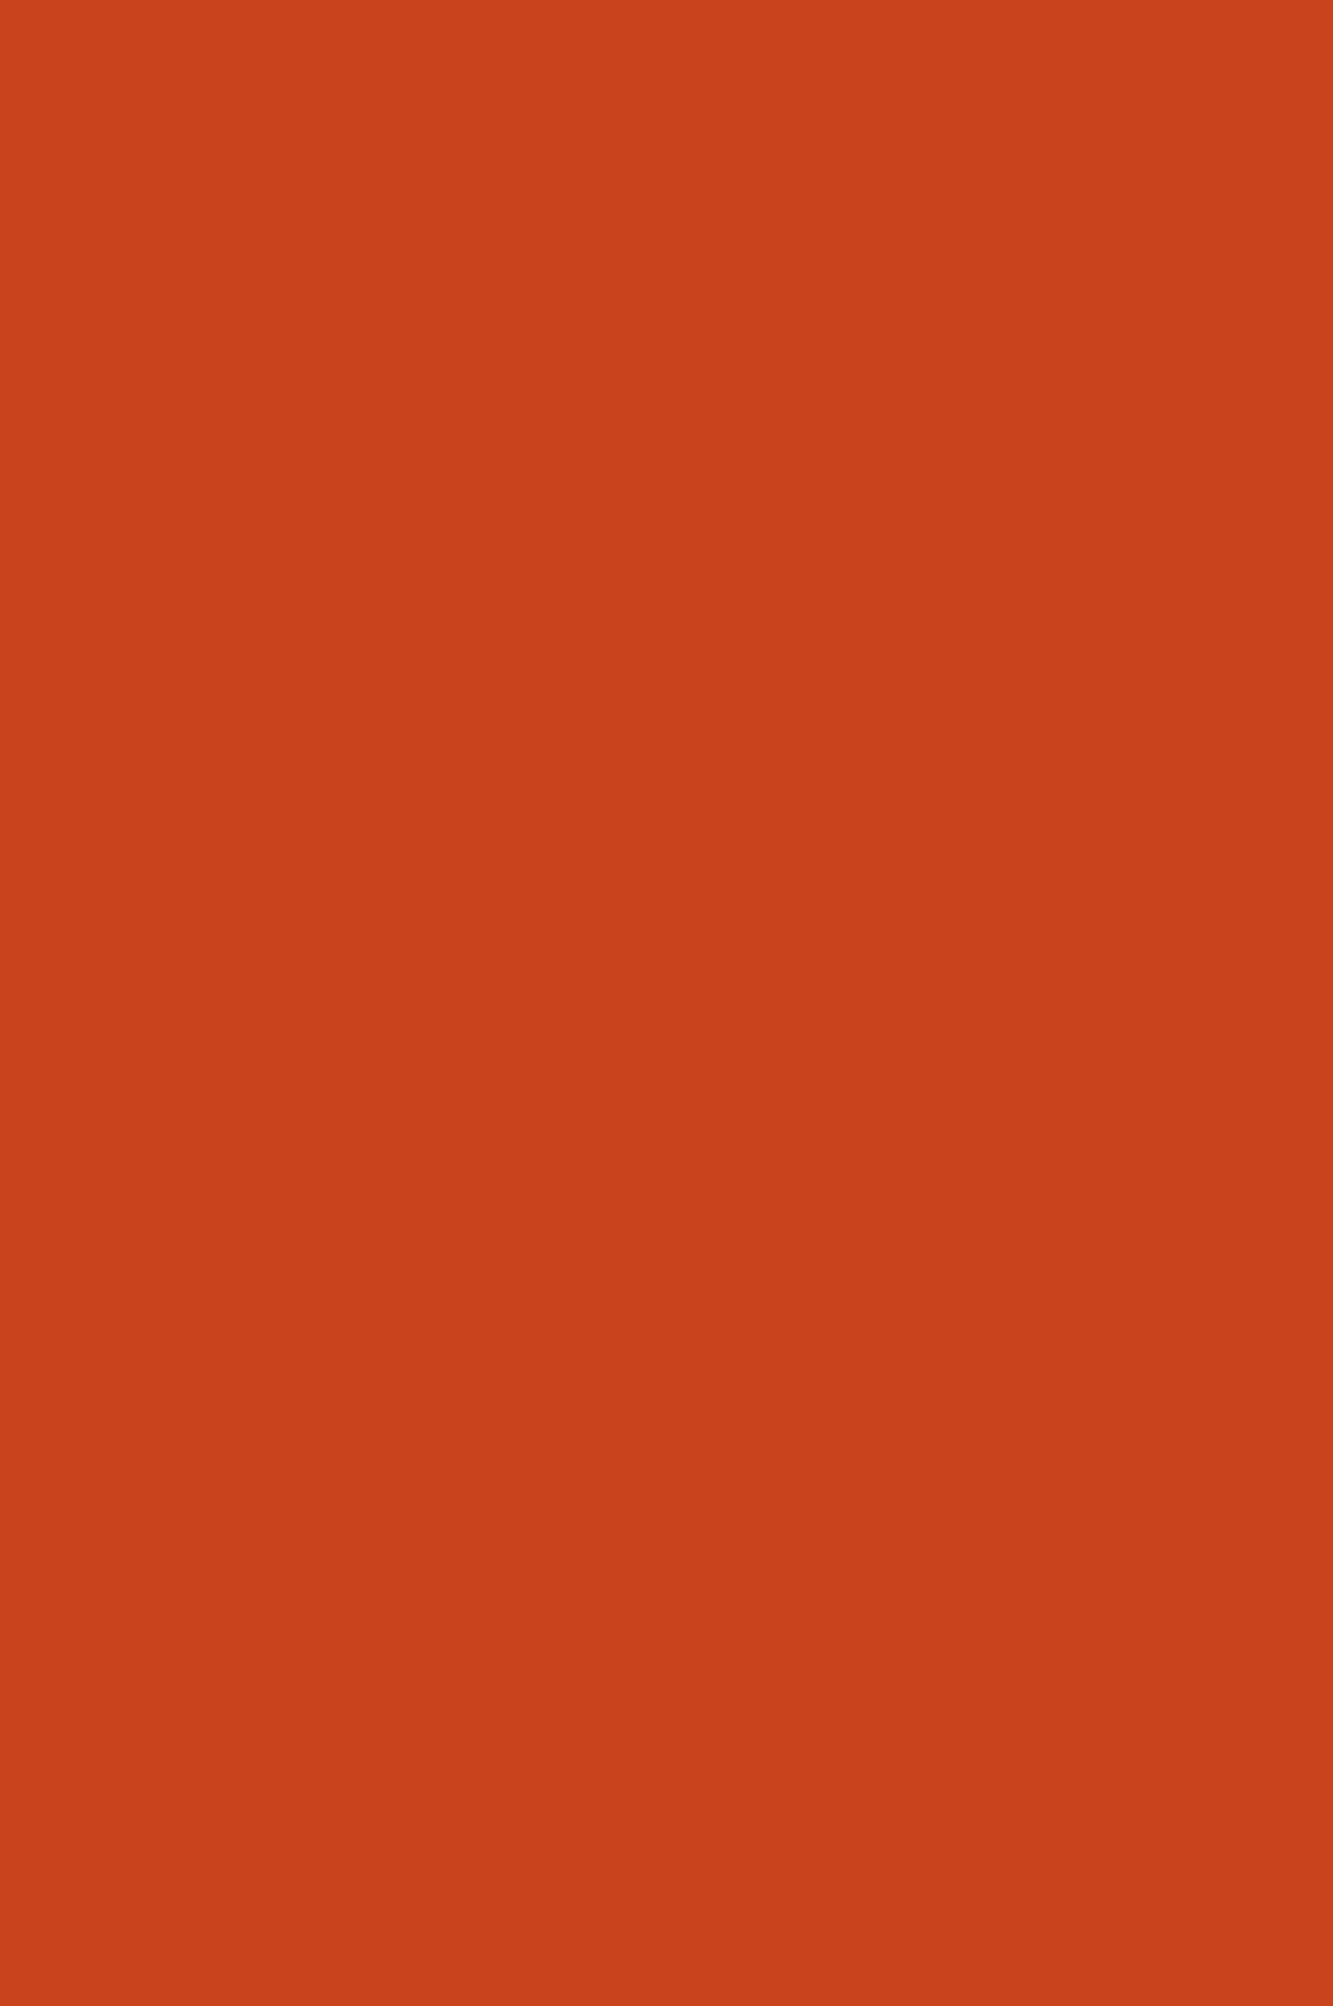 3026 HG Темно-оранжевый